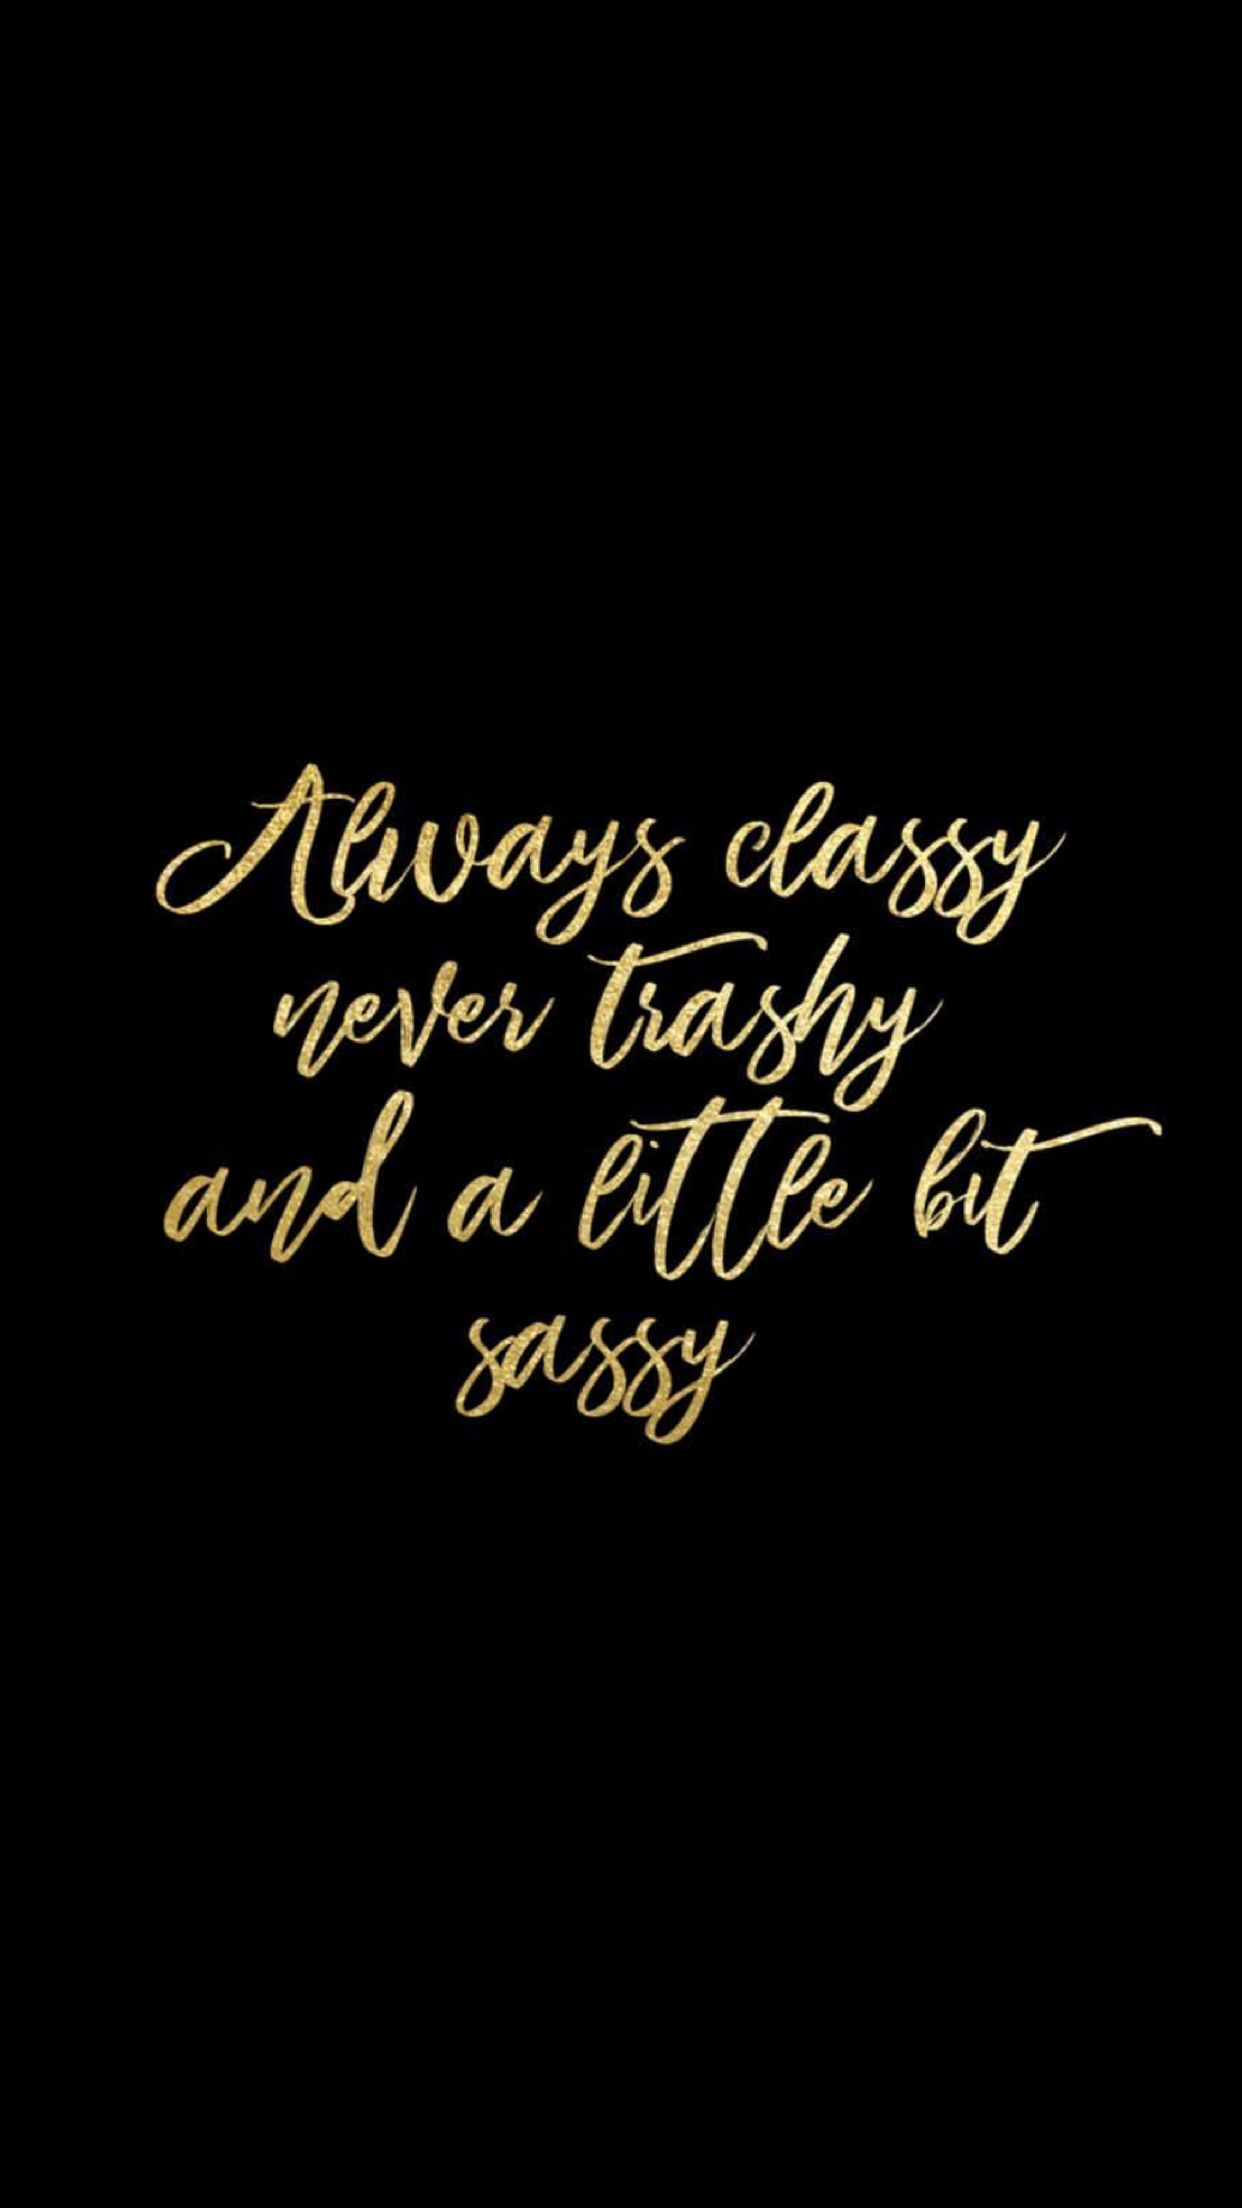 Sassy Classy Quotes Pinterest